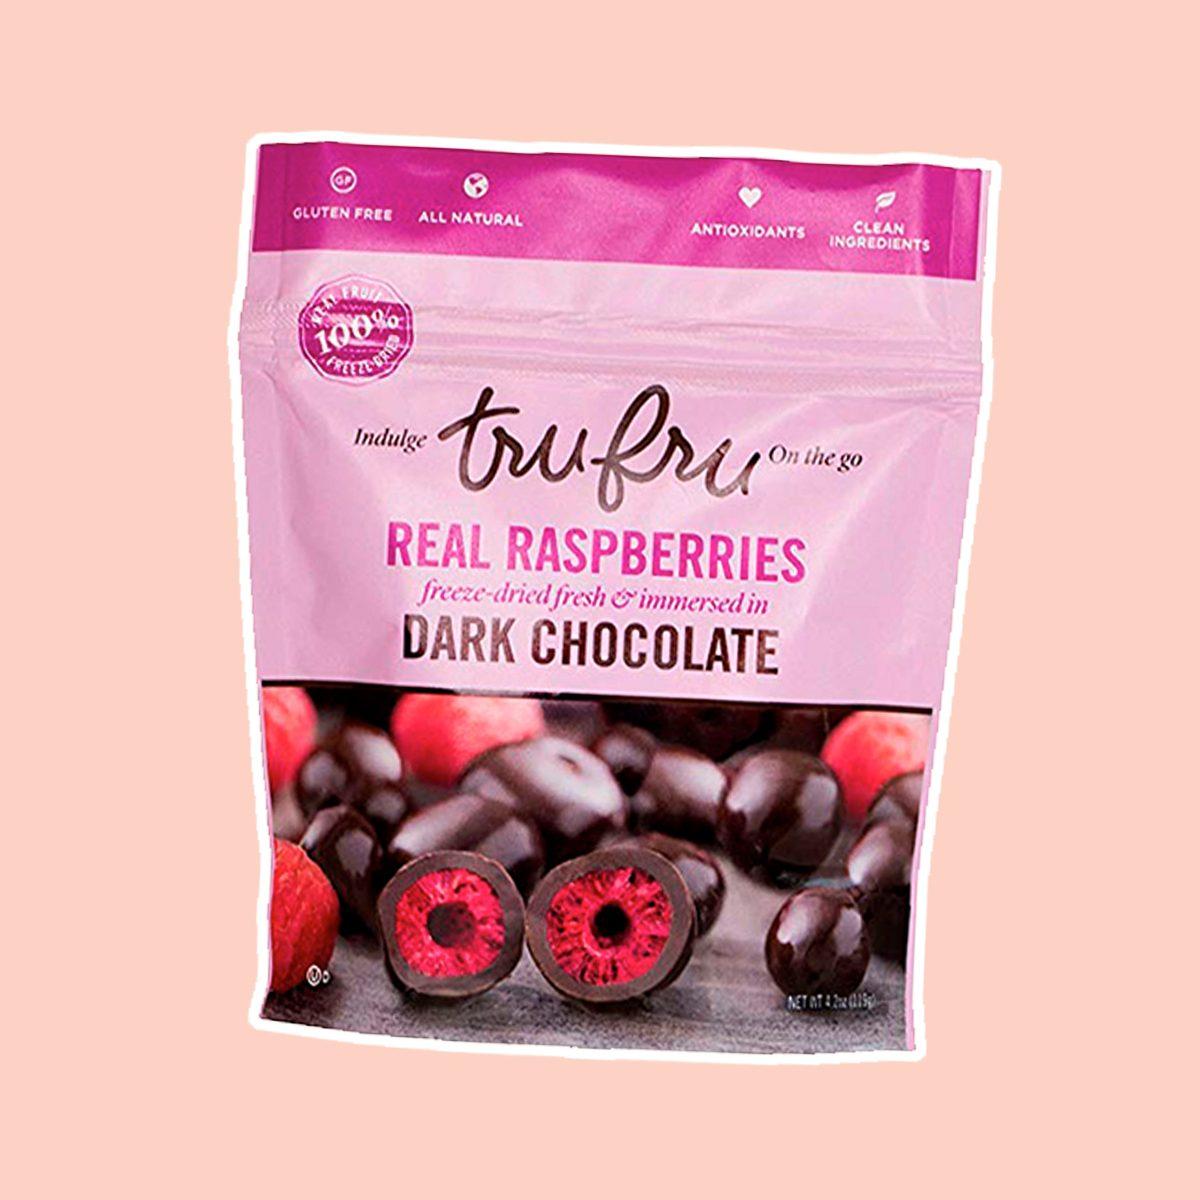 Tru Fru RASPBERRY PACK | 100% Freeze-Dried Fresh Raspberries Covered in Premium Dark Chocolate. 6ct-Pack Case, 4.2oz, 24 Servings (6-Raspberry)